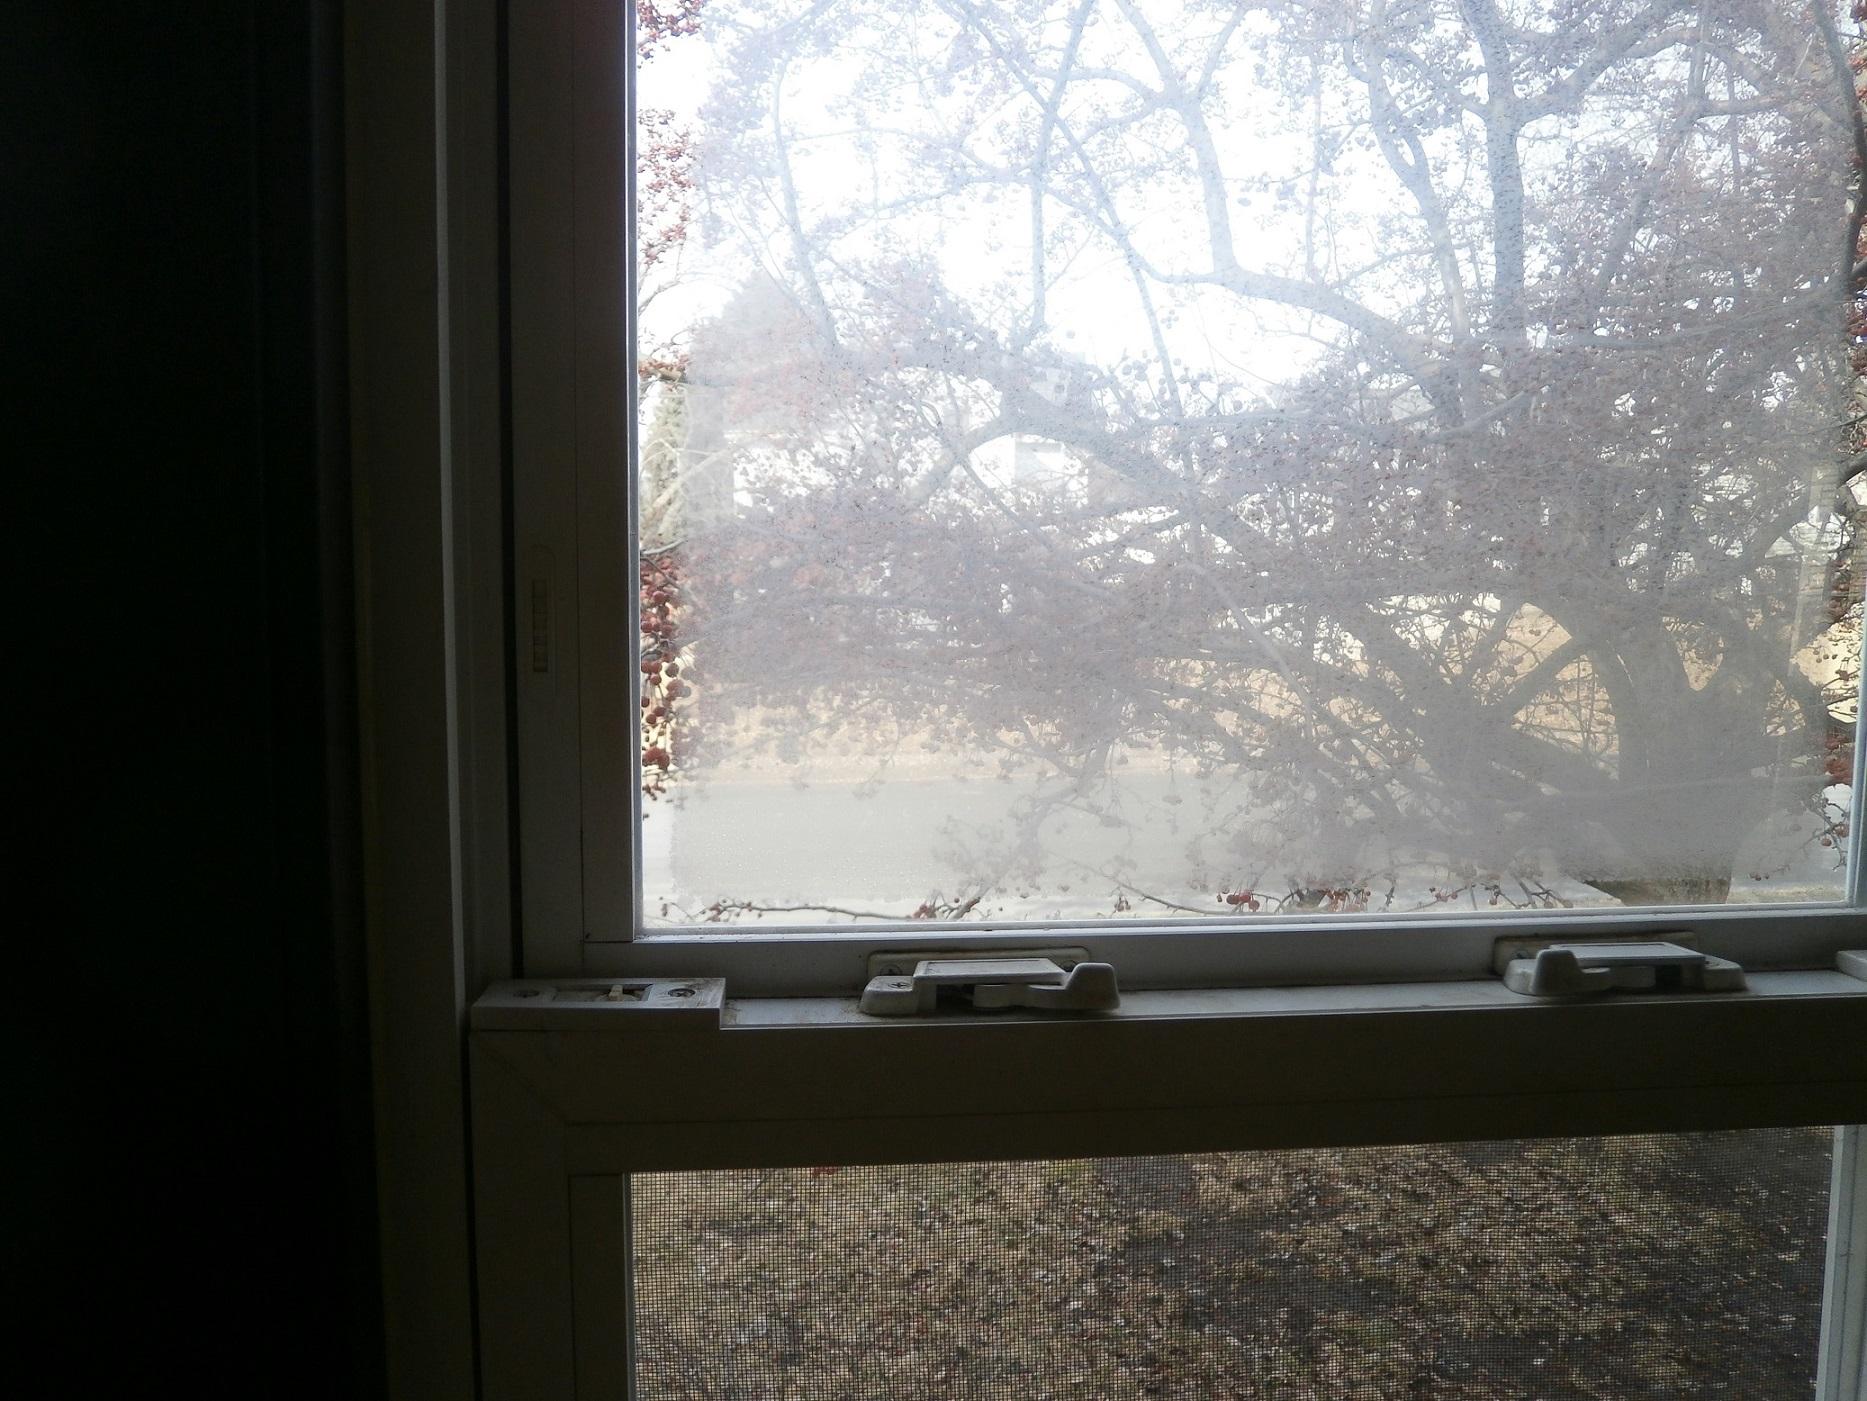 Window Fog